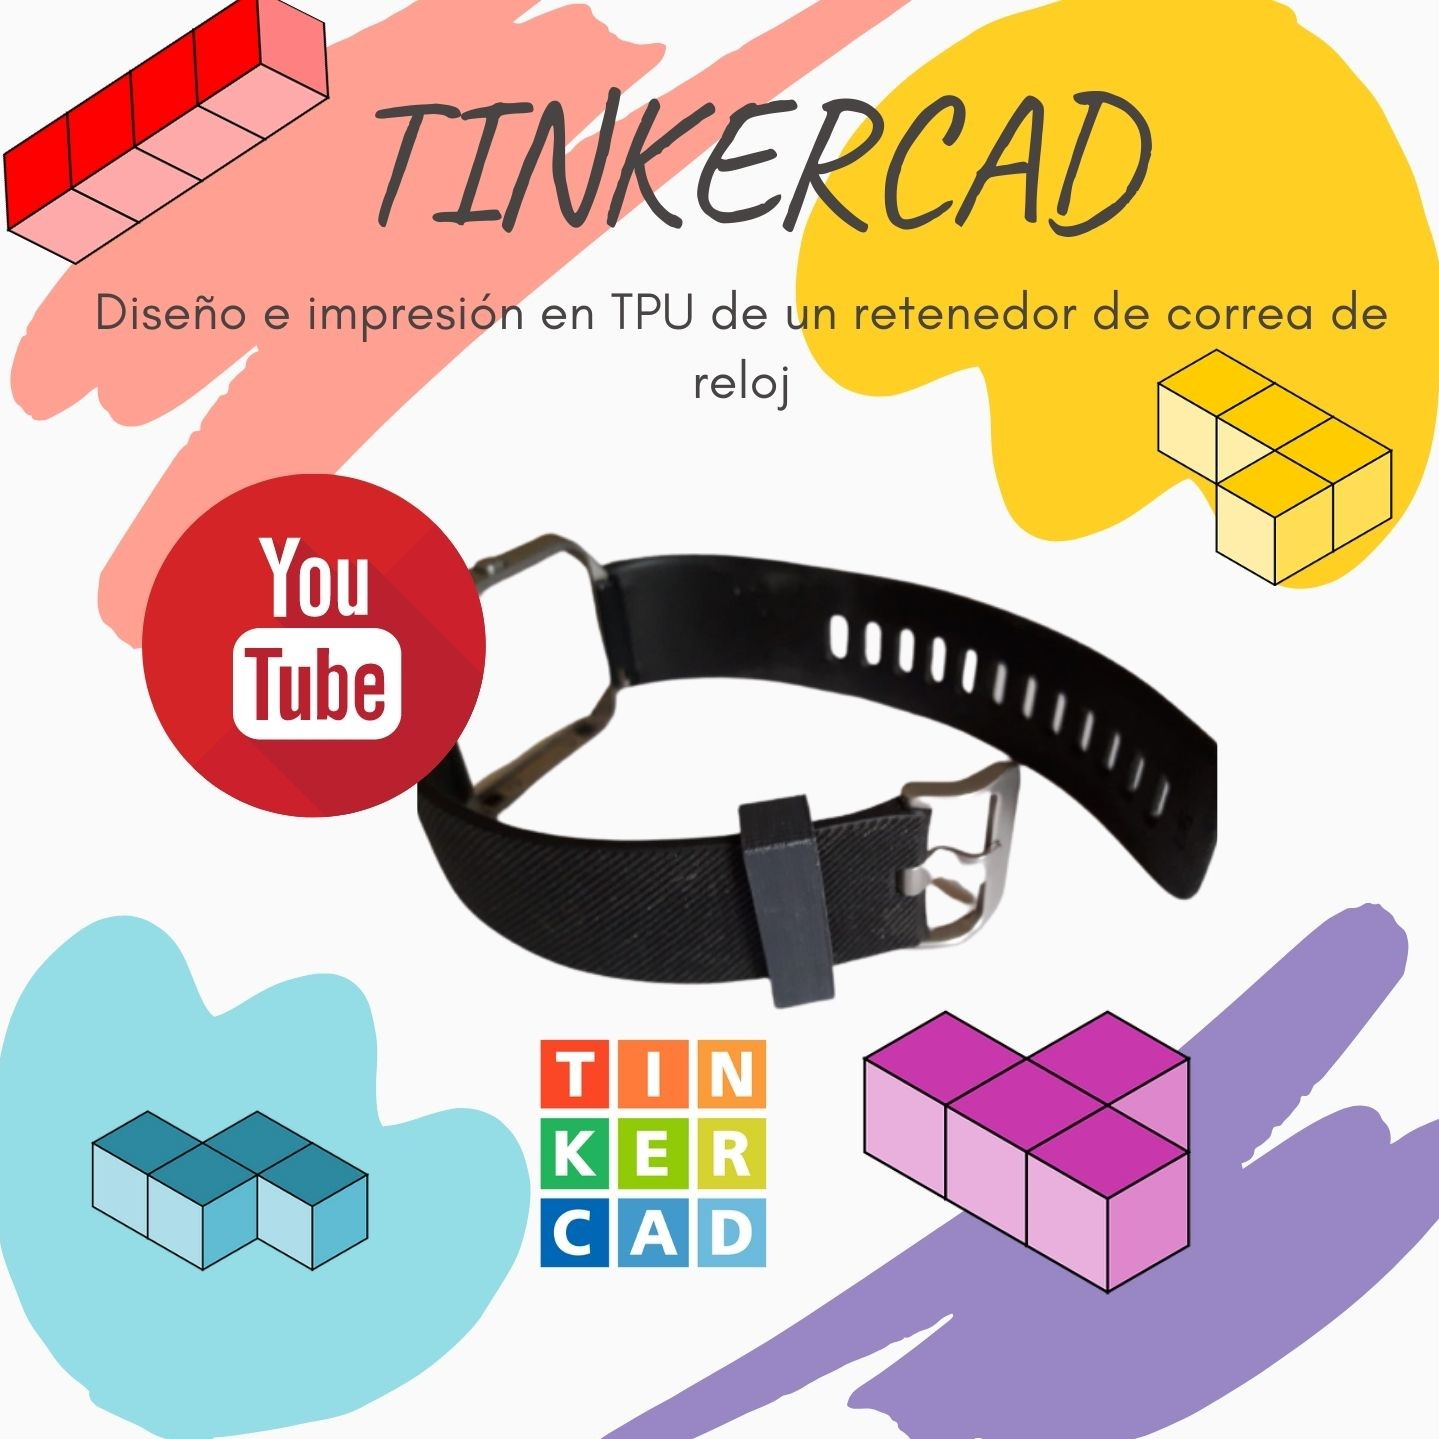 Diseño Tinkercad retenedor correa reloj